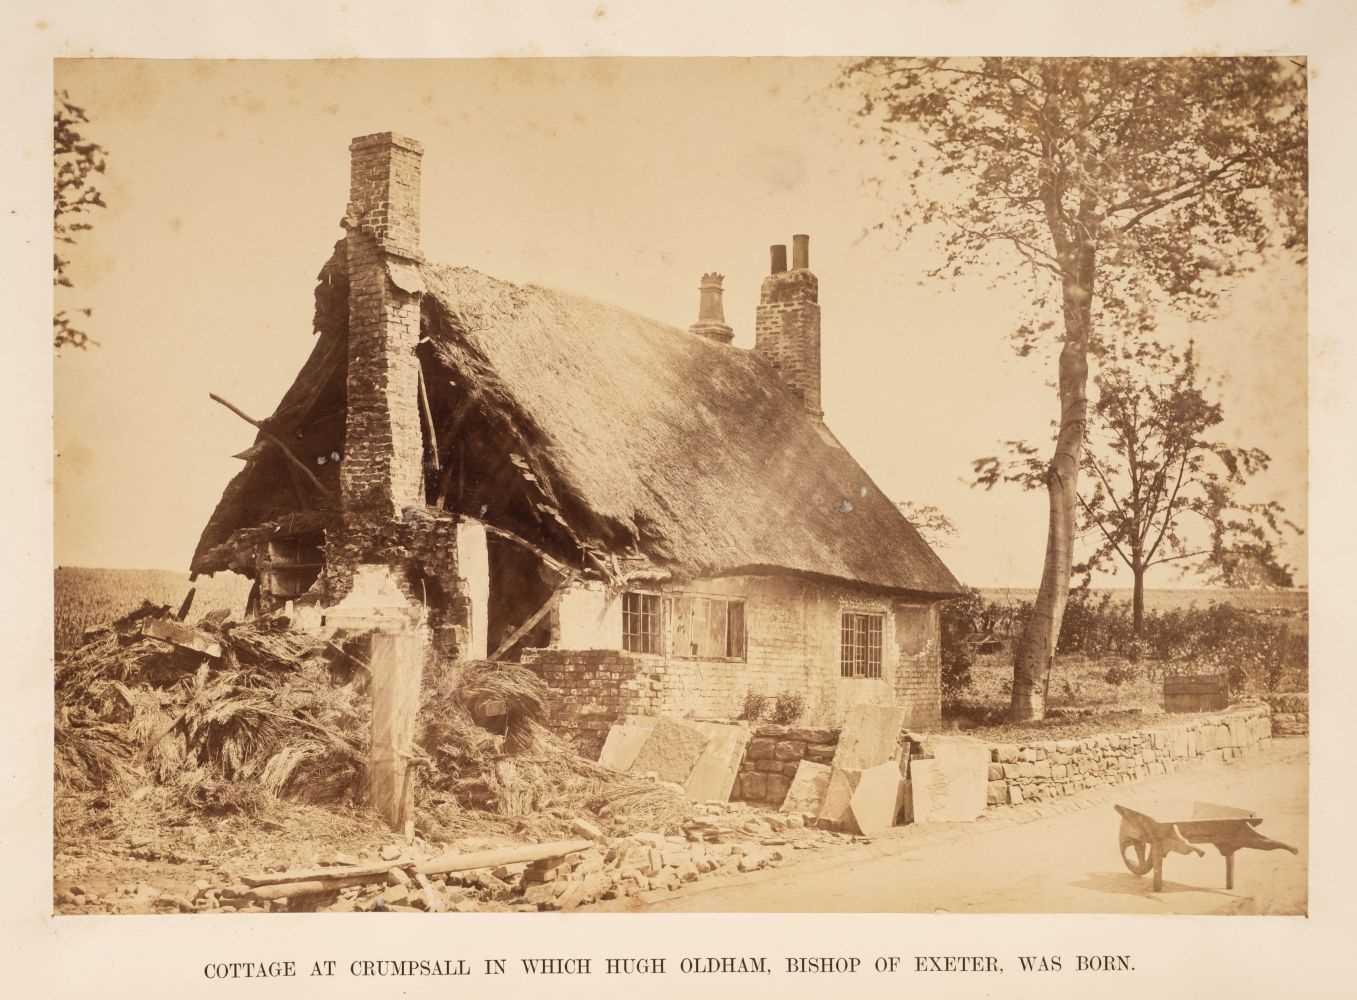 Lot 5 - Baker, Thomas. Memorials of Oldham's Tenement at Crumpsall in the Parish of Manchester